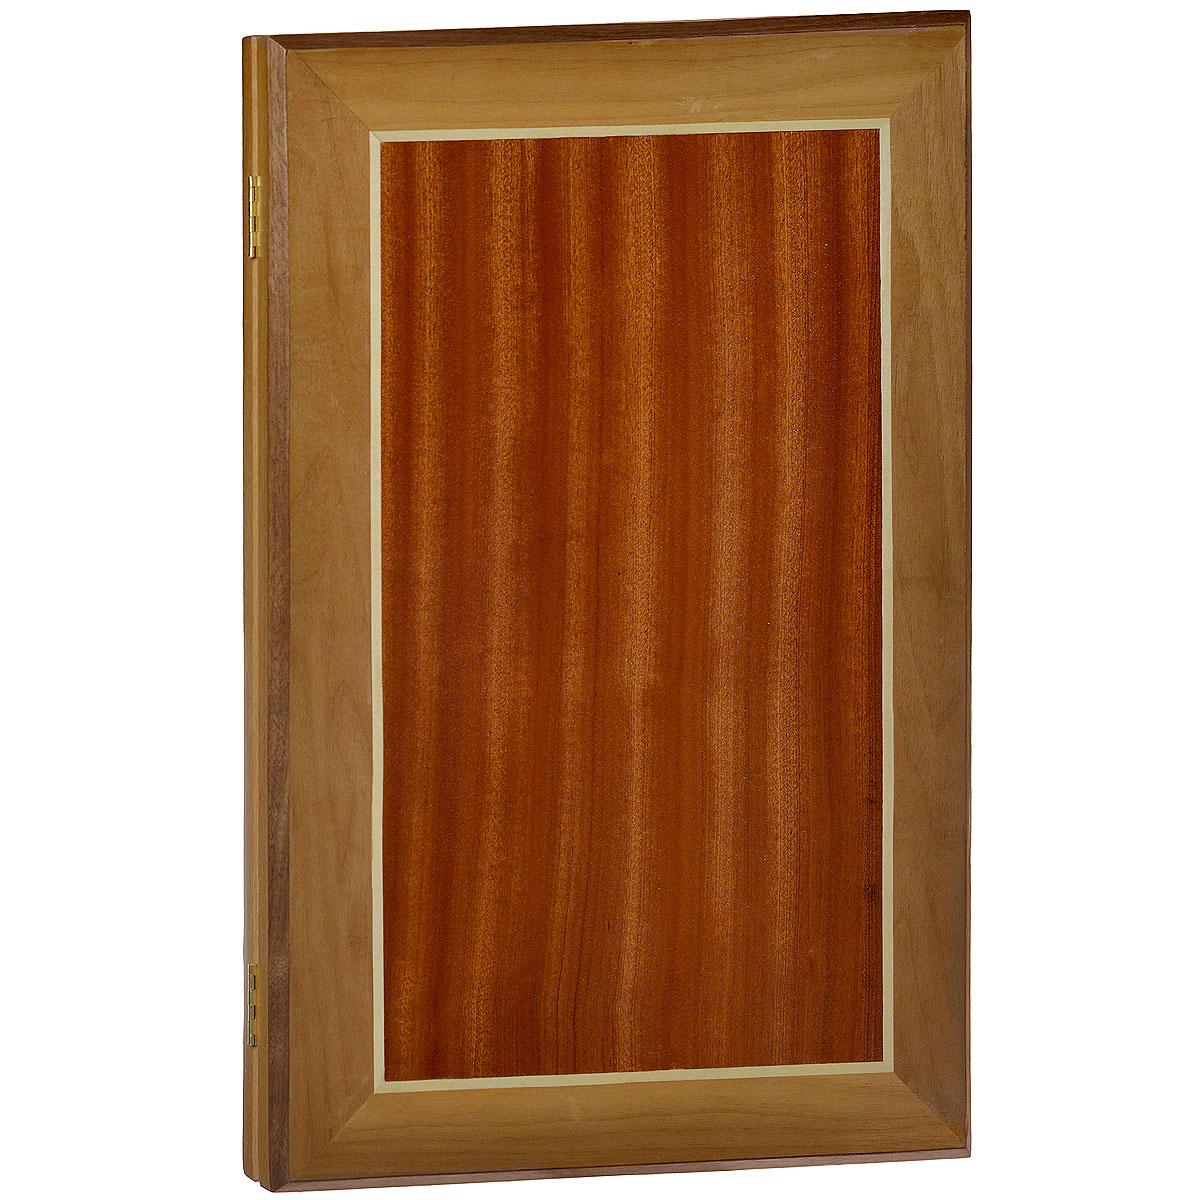 Нарды большие Квадрат, цвет: коричневый, размер: 58х37х5 см. 10011001